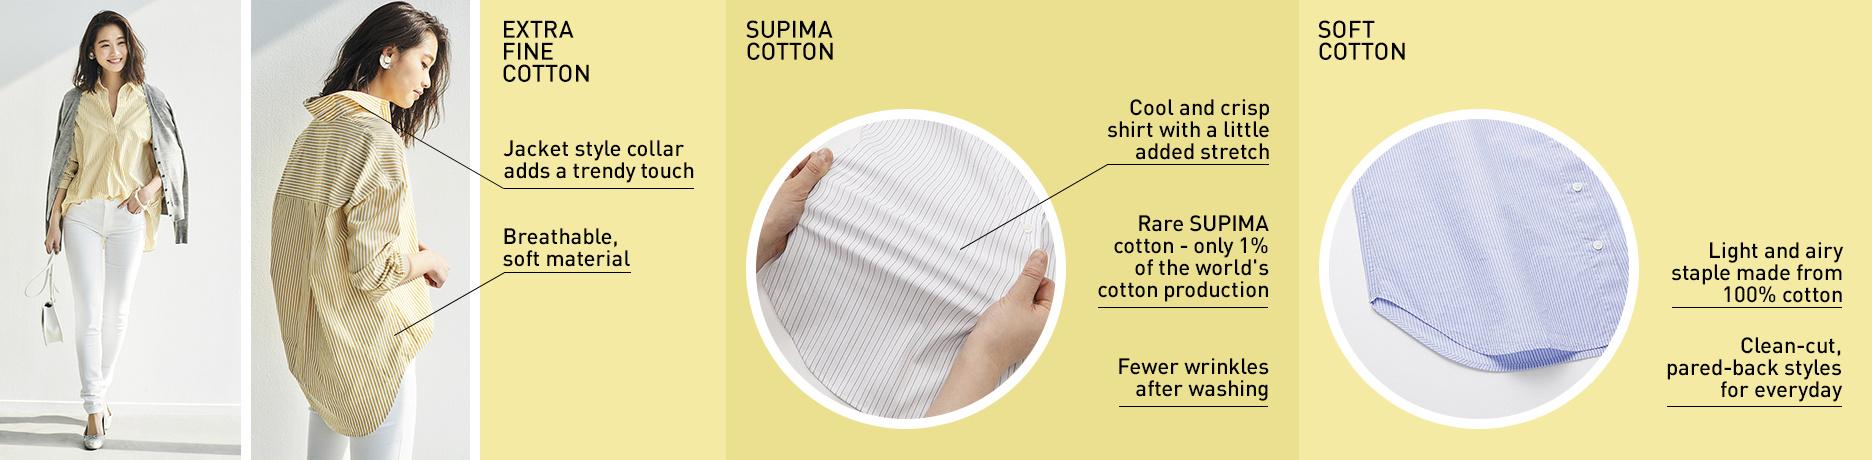 extra cotton